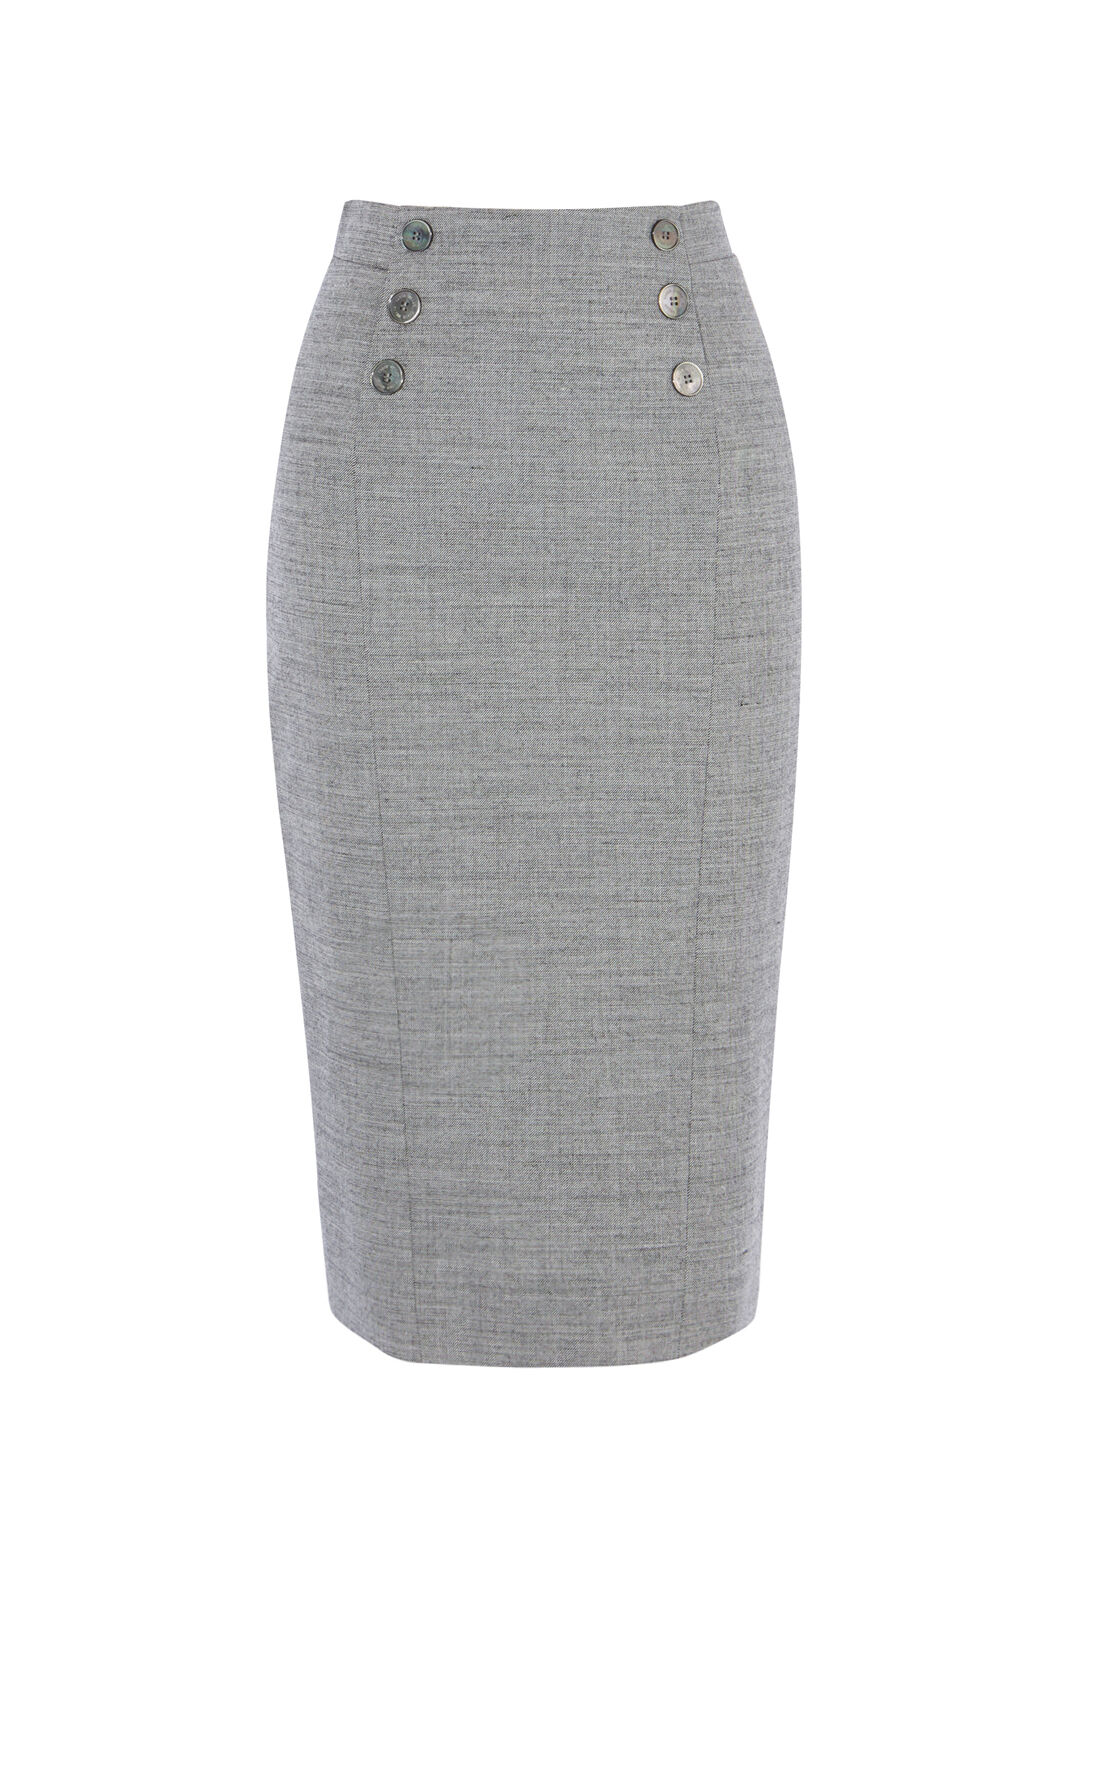 Karen Millen, TAILORED SKIRT Grey 0